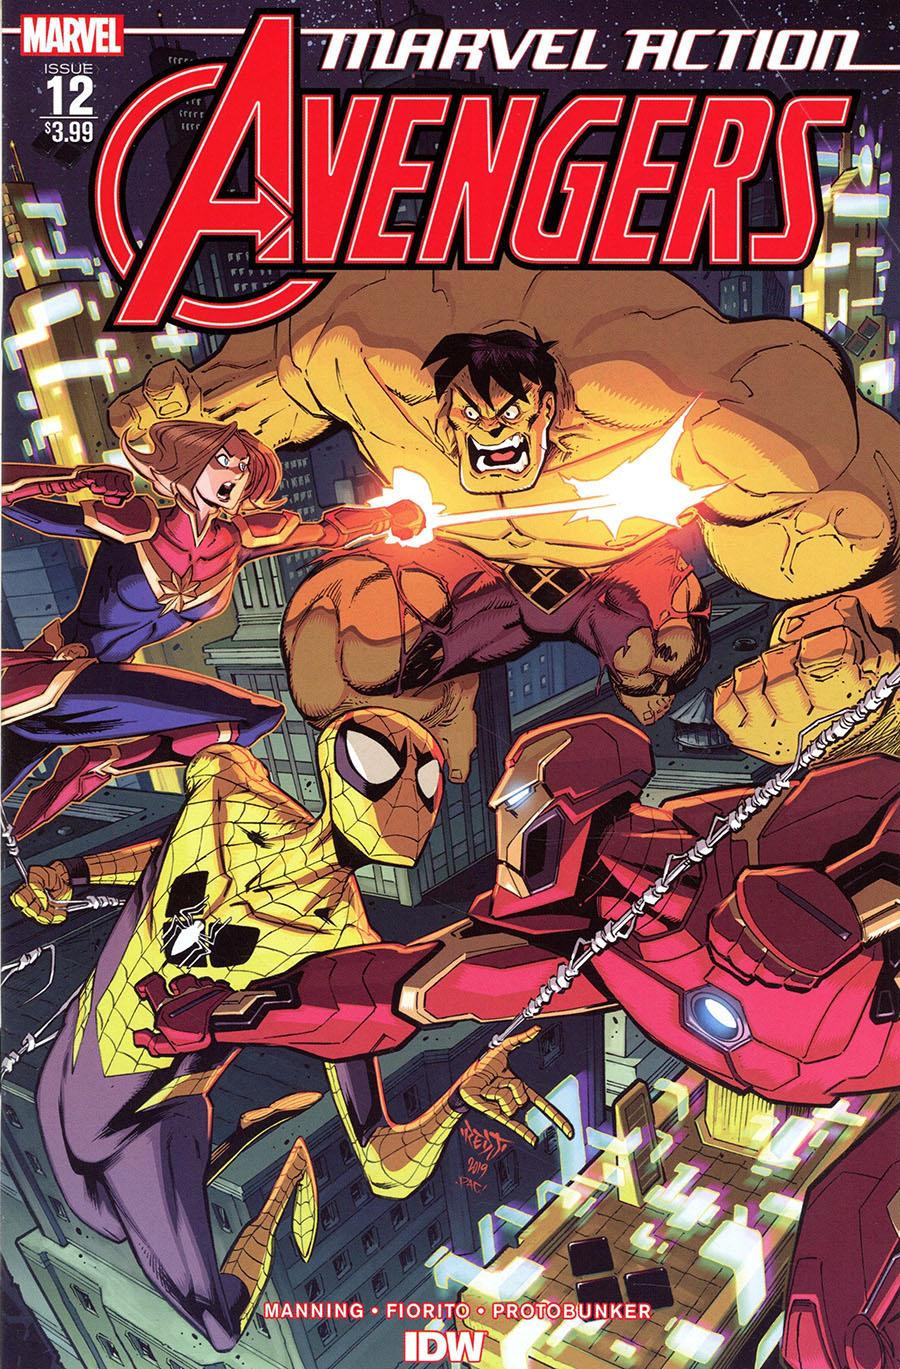 Marvel Action Avengers #12 Cover A Regular Marcio Fiorito Cover